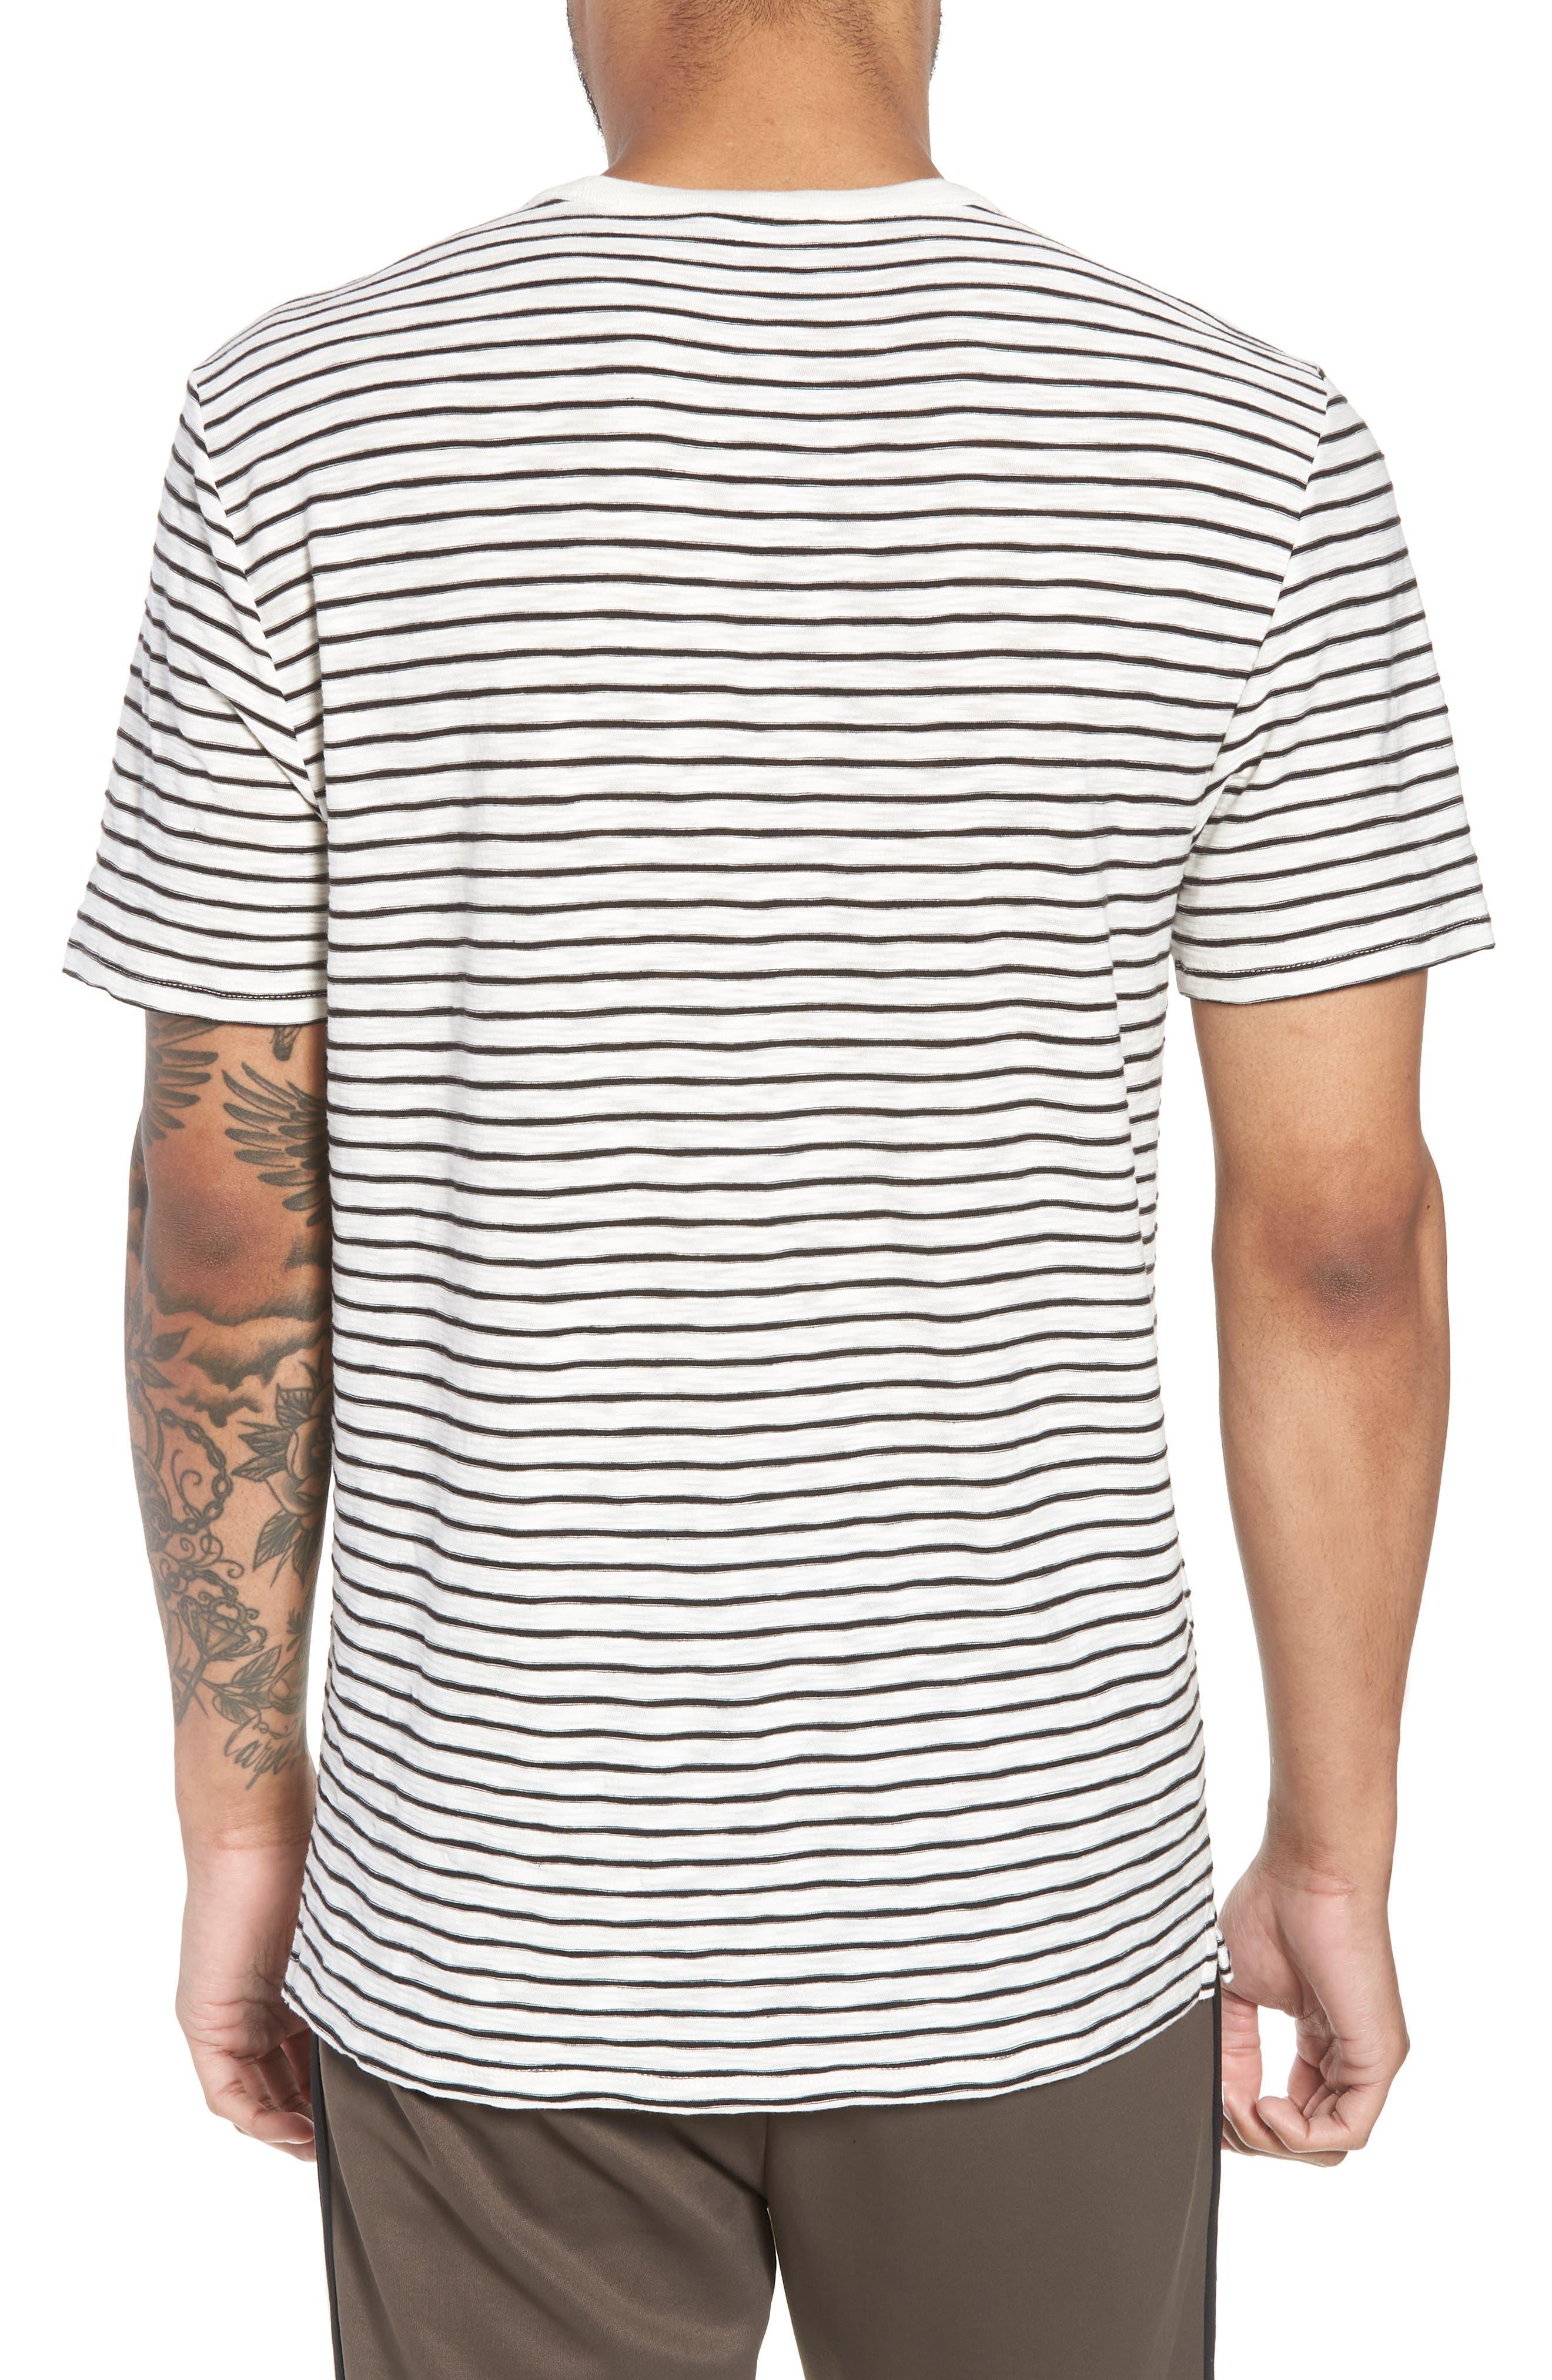 Stripe Crewneck T-Shirt,                             Alternate thumbnail 2, color,                             Off White/ Black